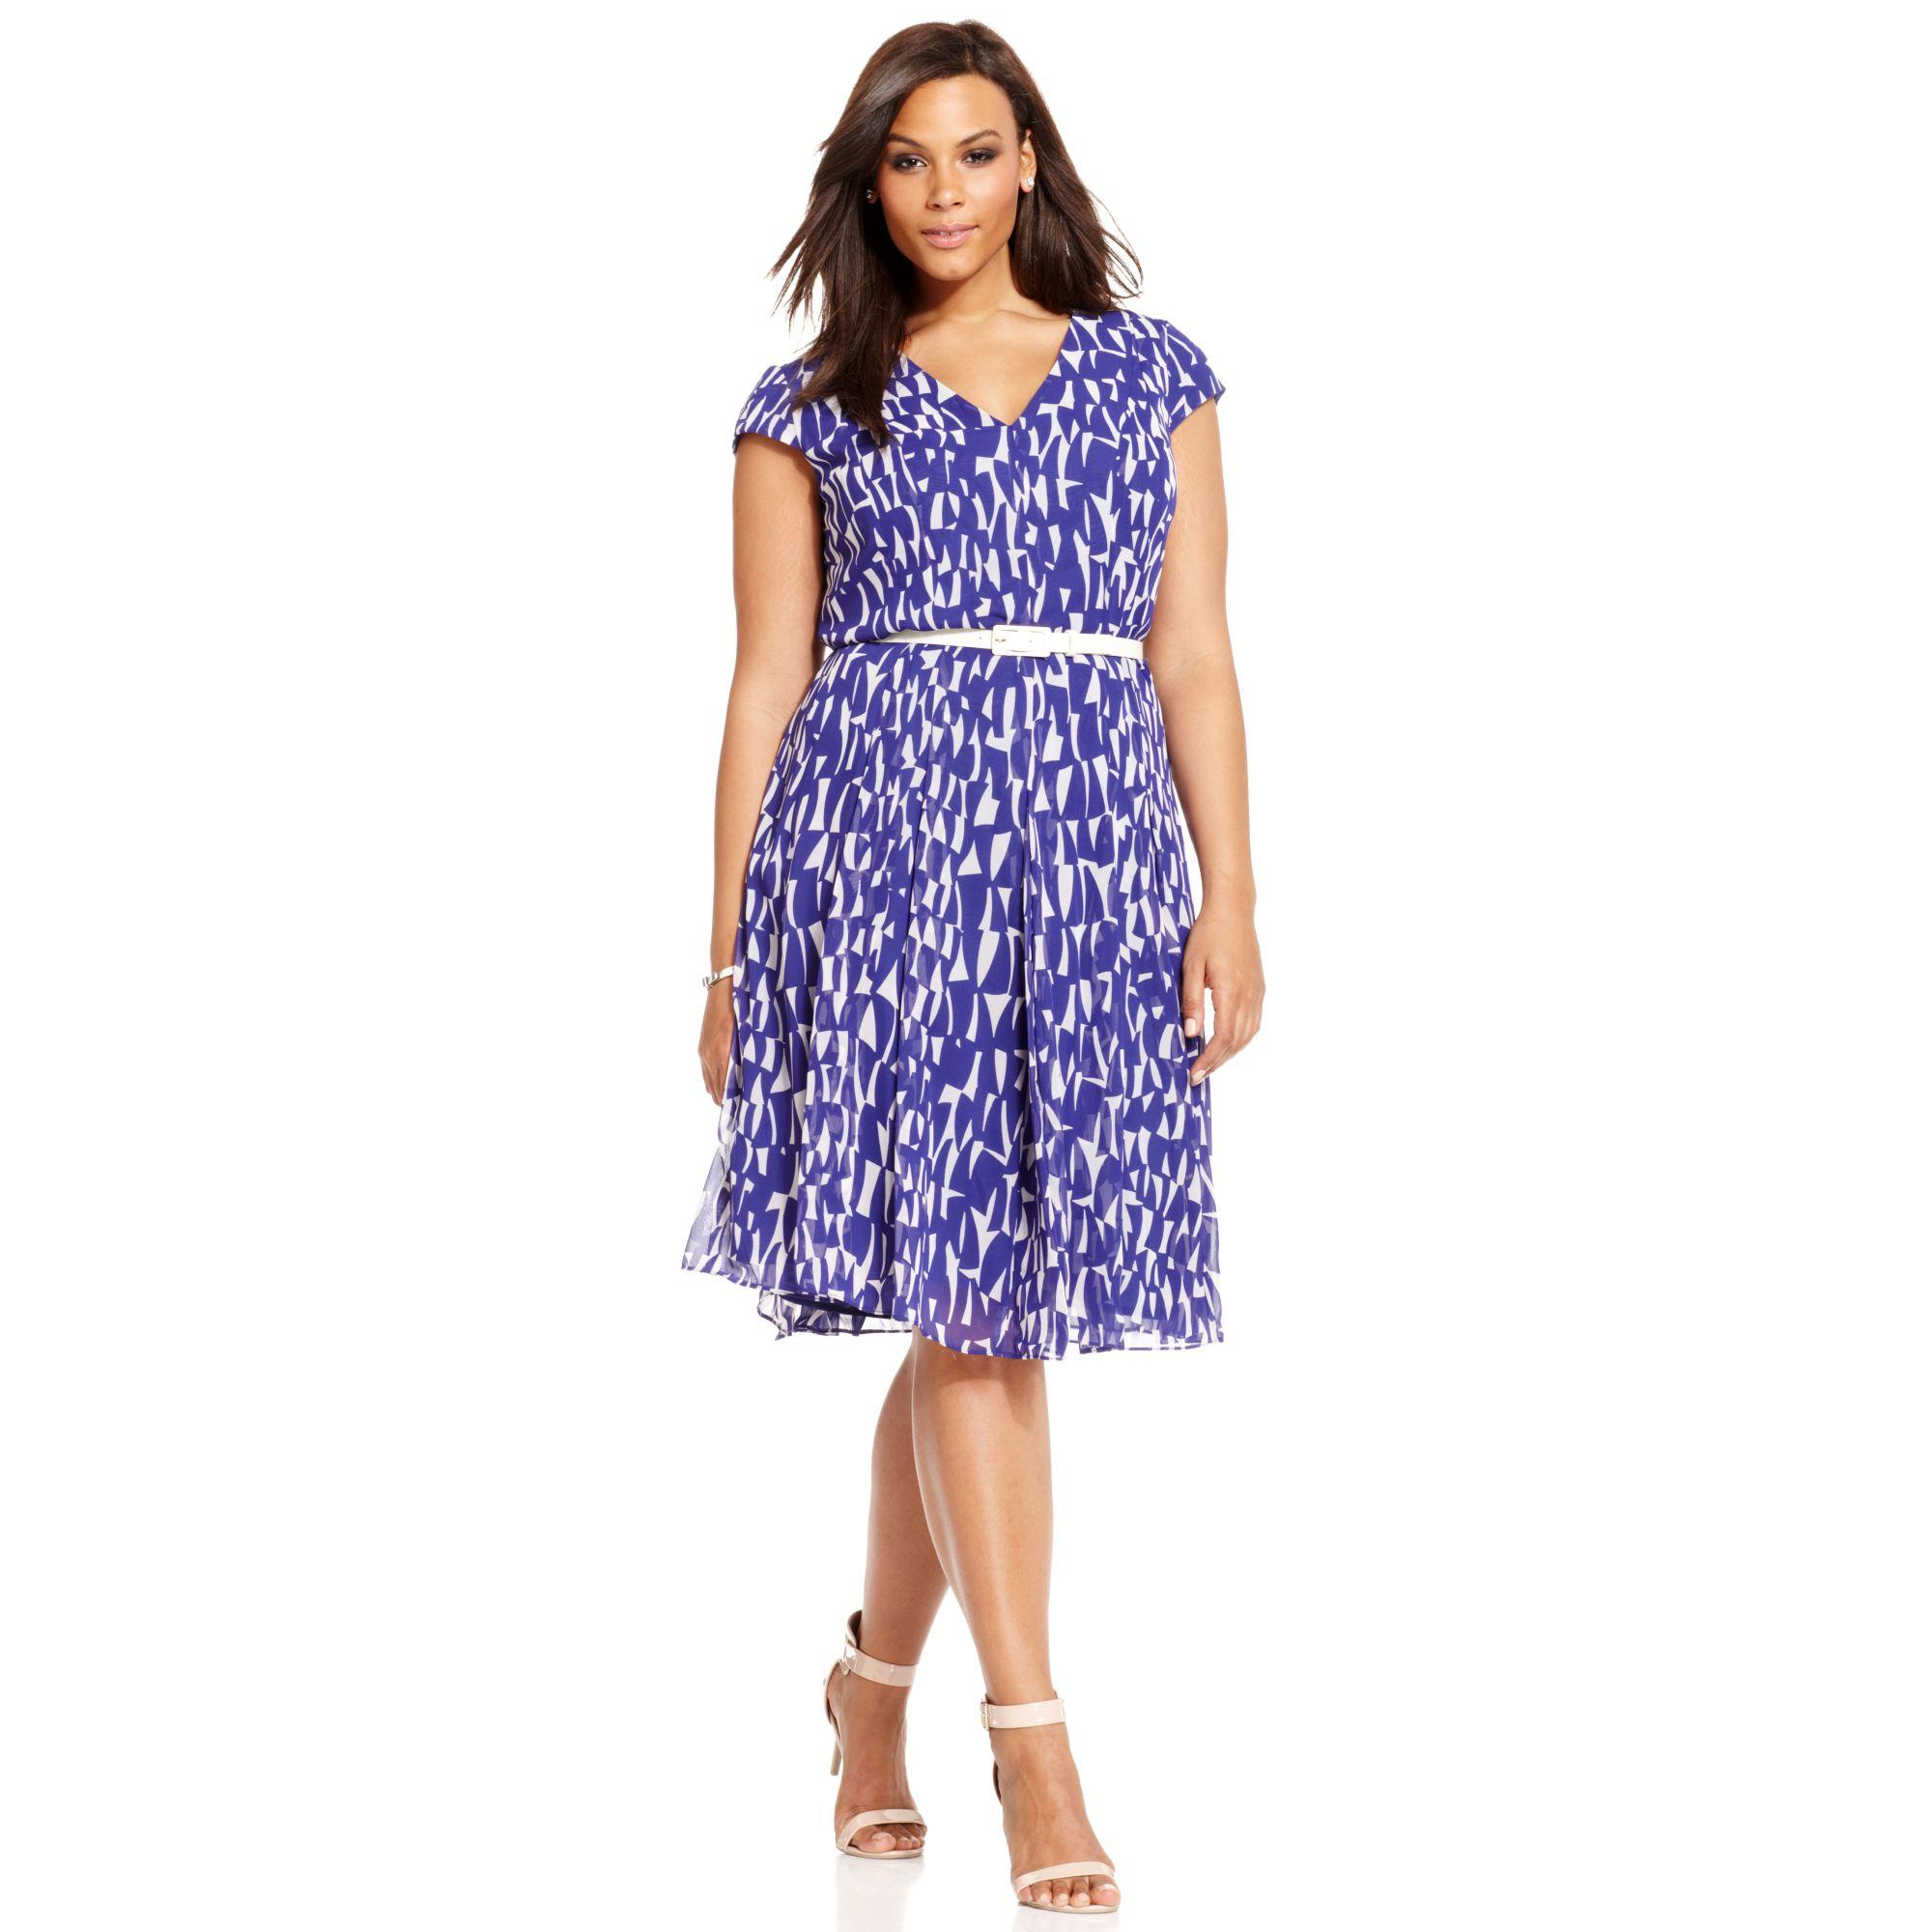 HD wallpapers plus size anne klein dresses